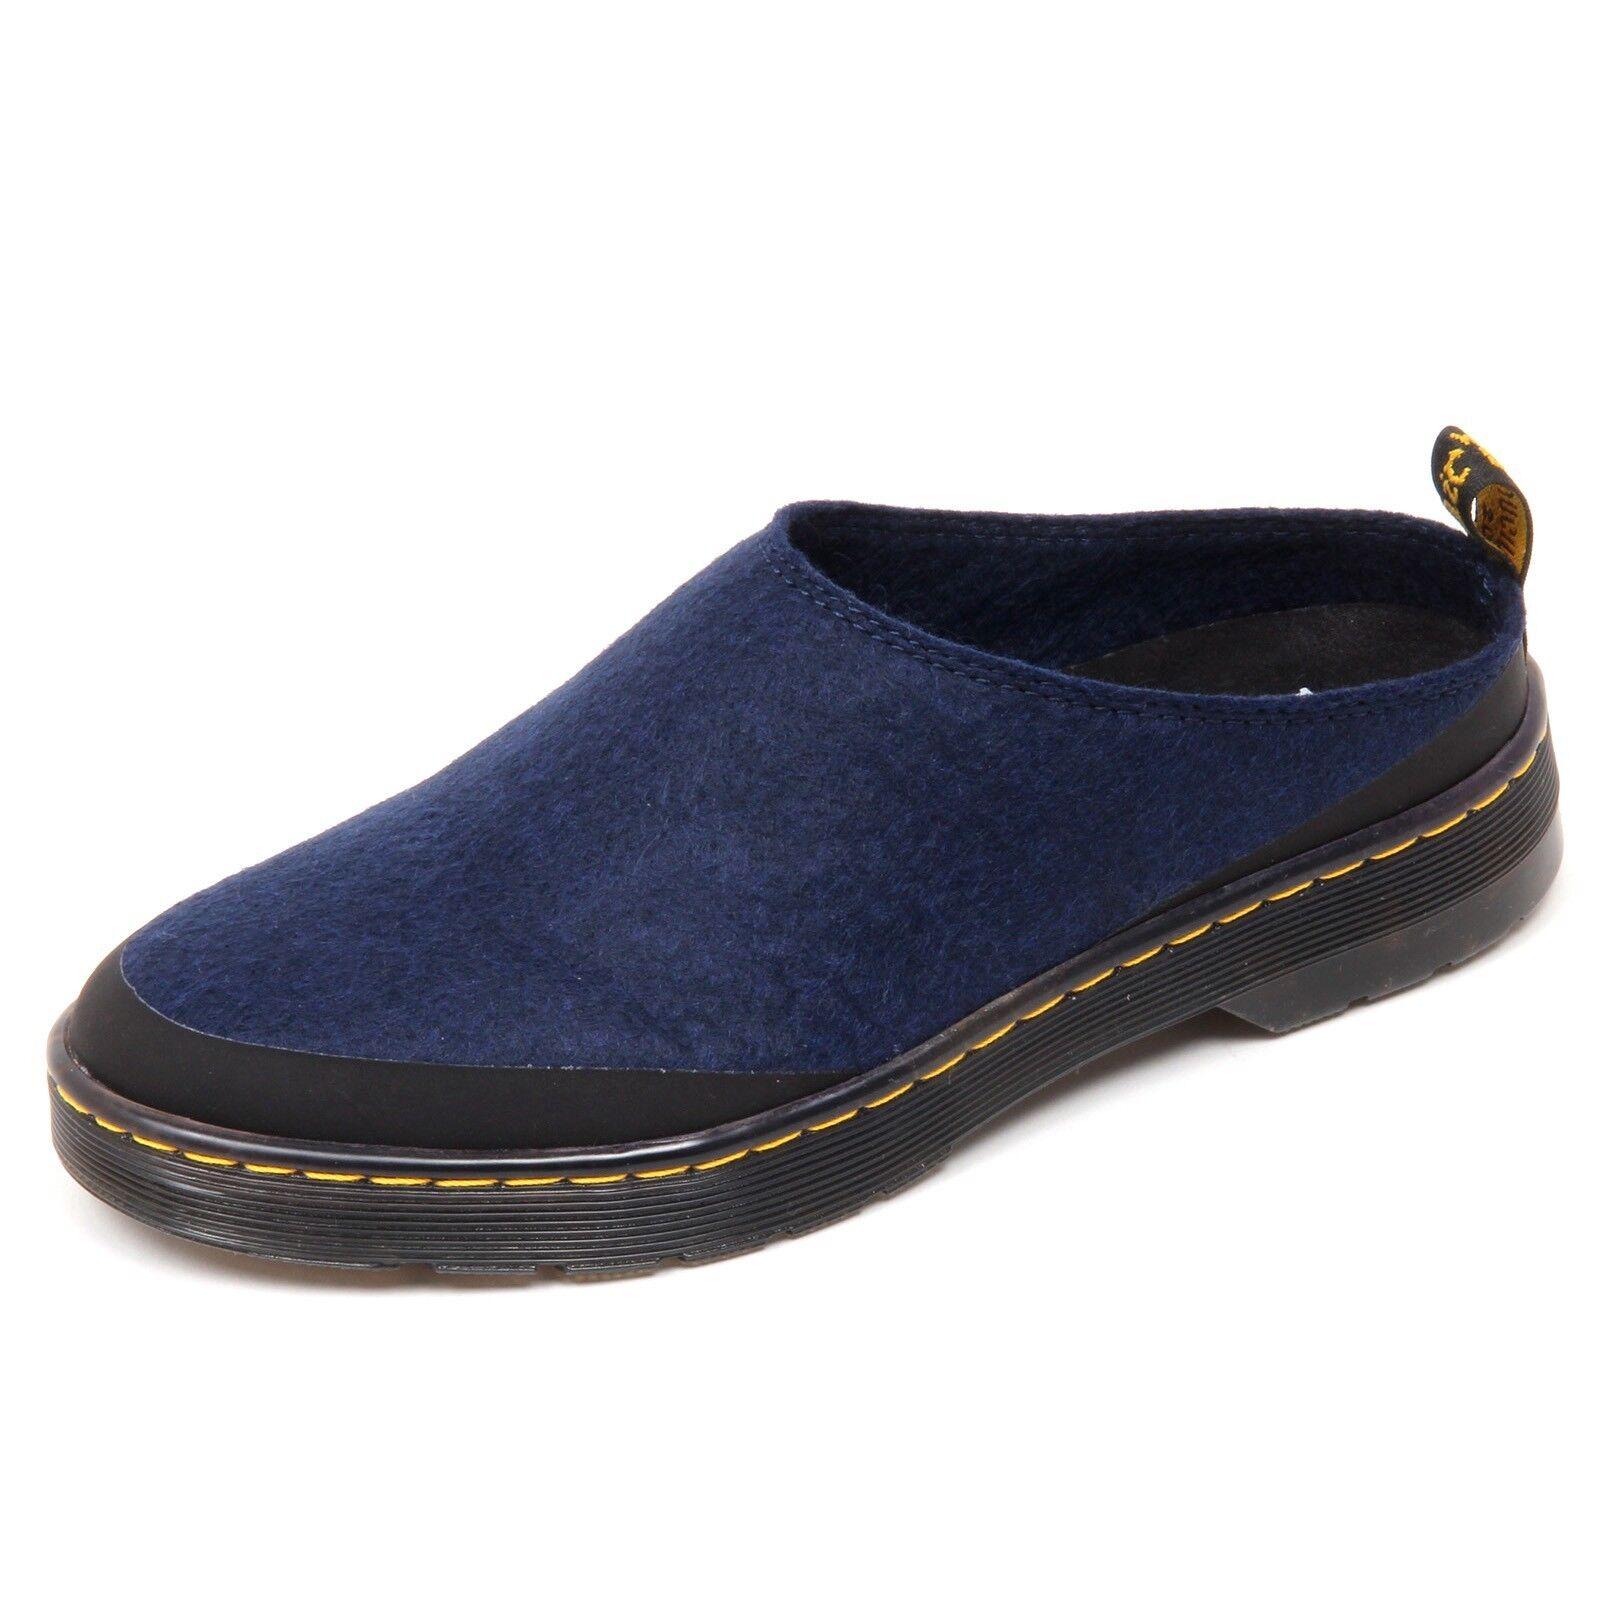 D1730 sabot mujer zapatos DR. MARTENS ELYSIA  zapatos mujer grigio Zapatos MUJER db6c92